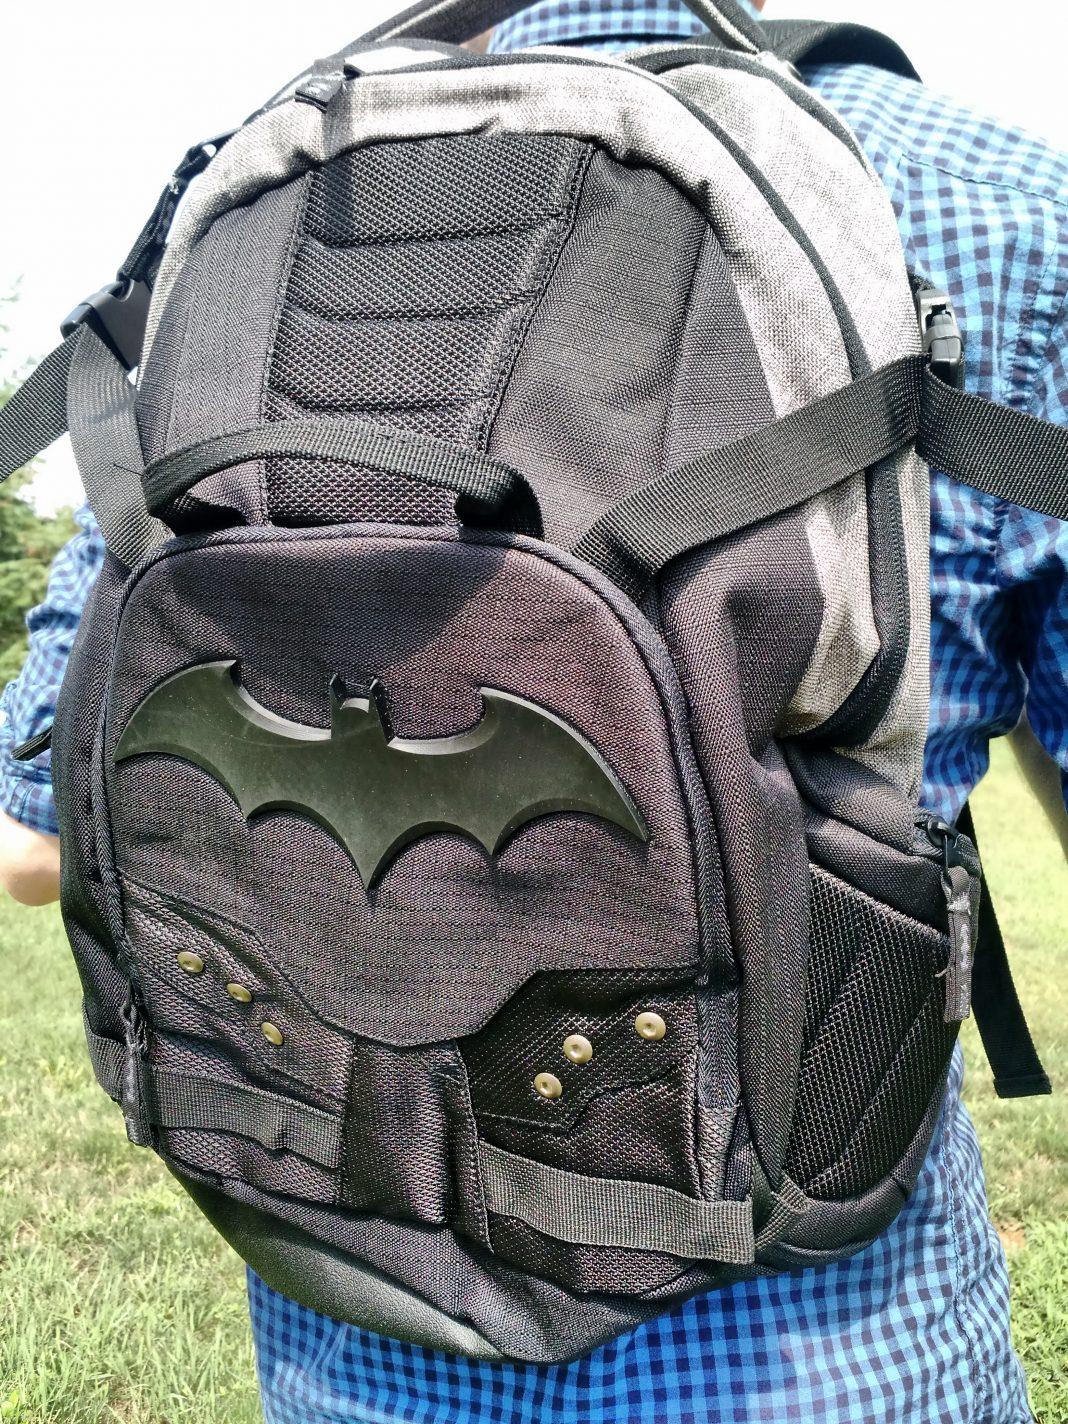 It's the Batman Symbol Two-Tone Built Backpack